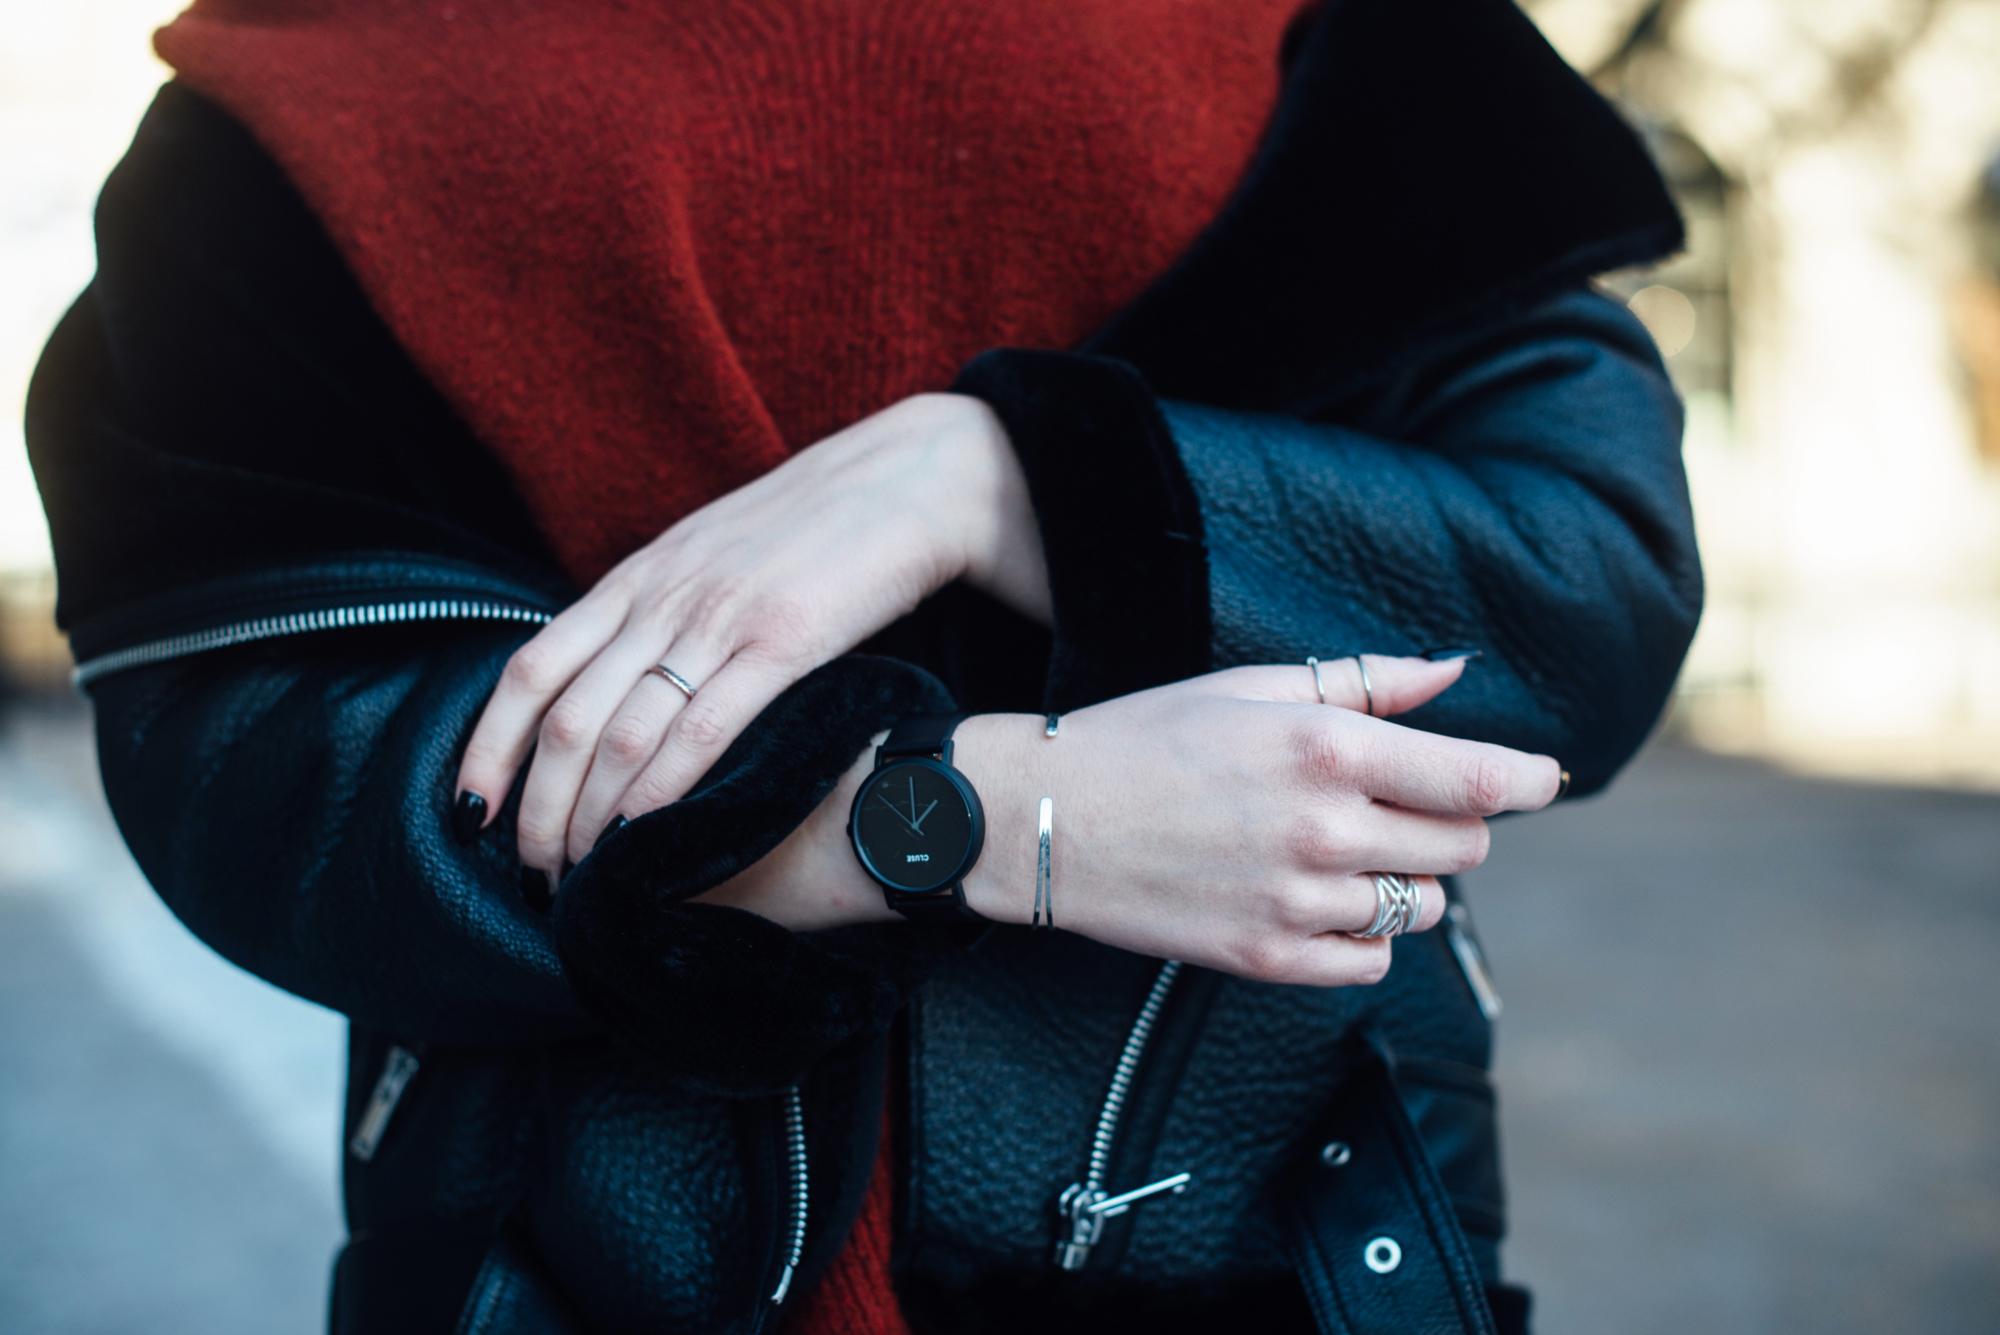 04-Kiamisu-Modeblog-Fashion Week Berlin_Shearling Jacke_Tamaris Stiefeletten_Schiebermütze-22